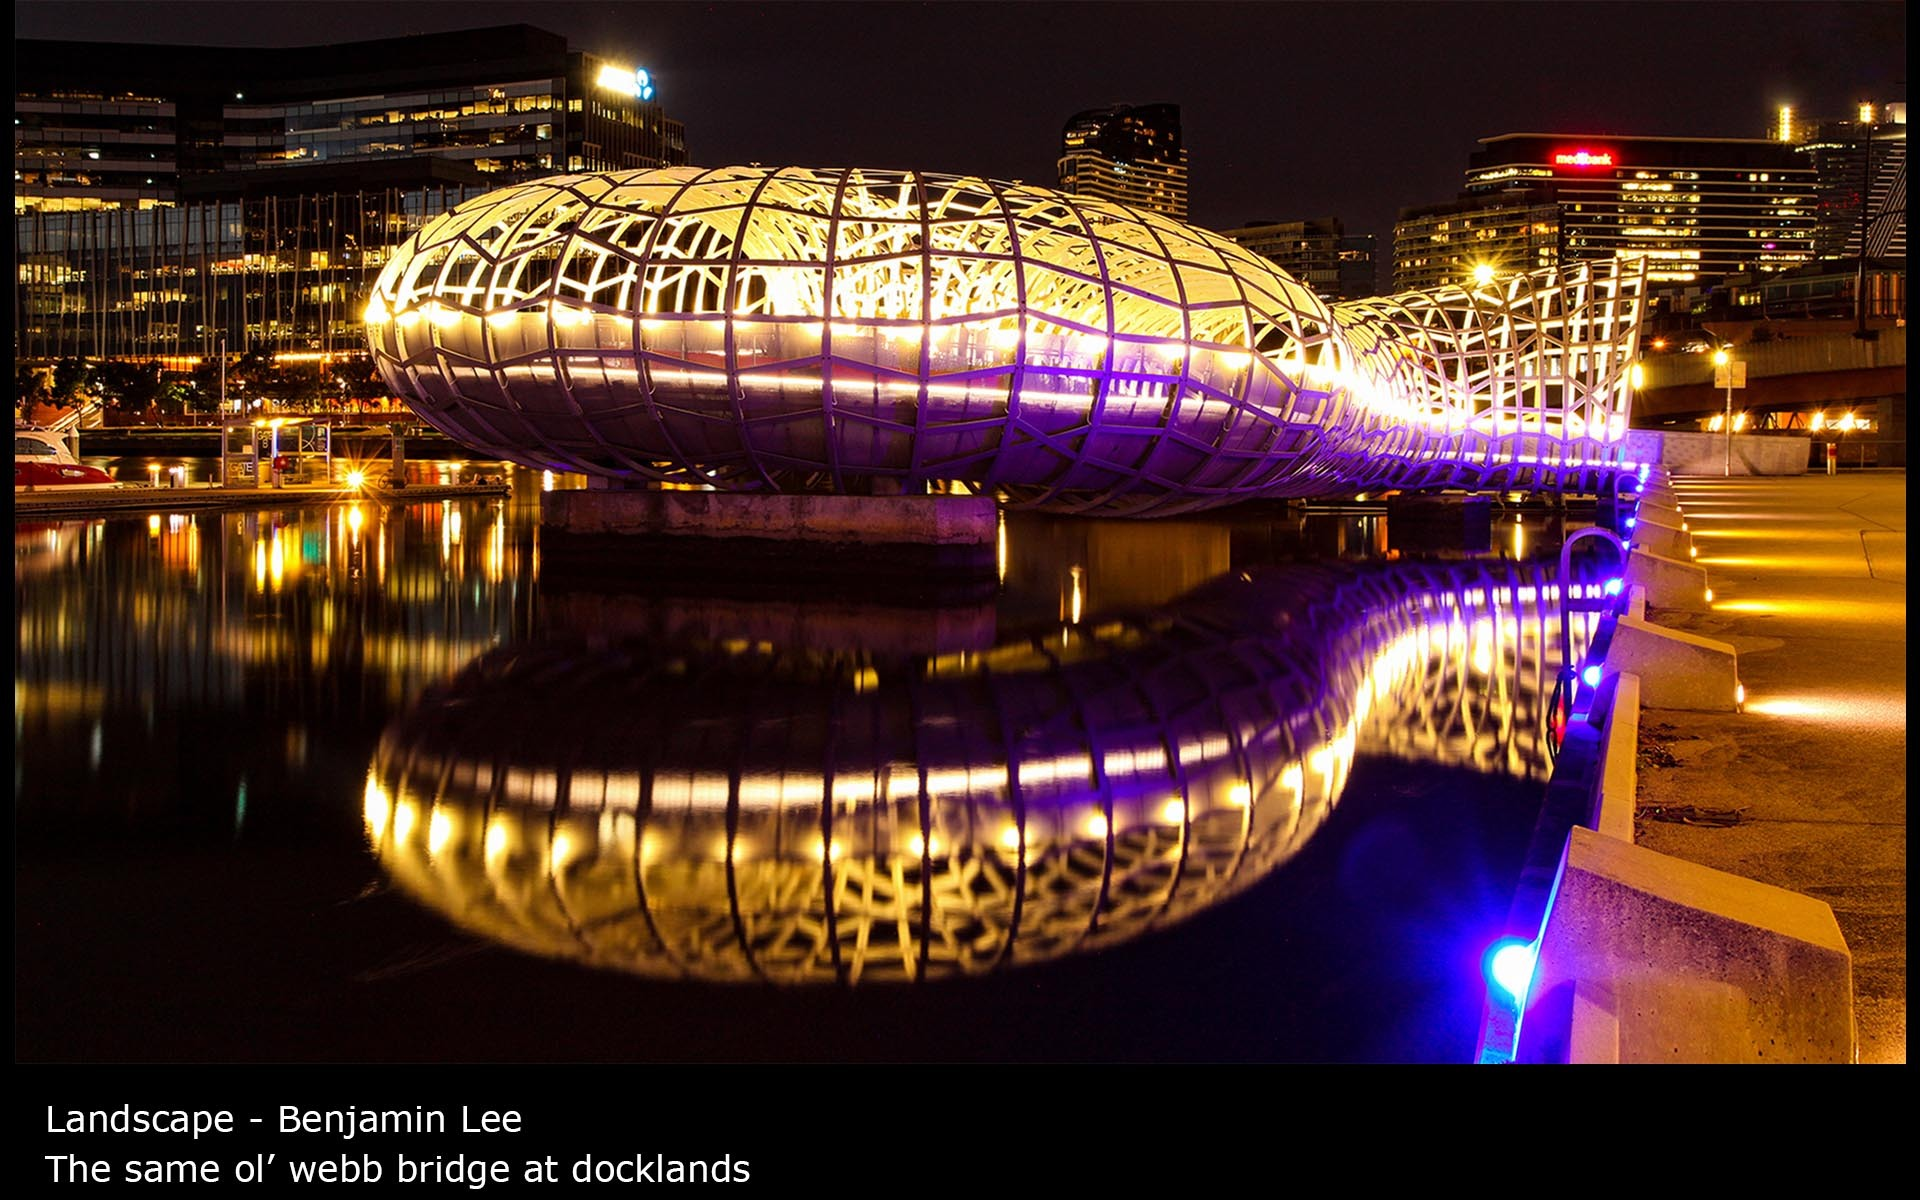 The same ol' webb bridge at docklands - Benjamin Lee